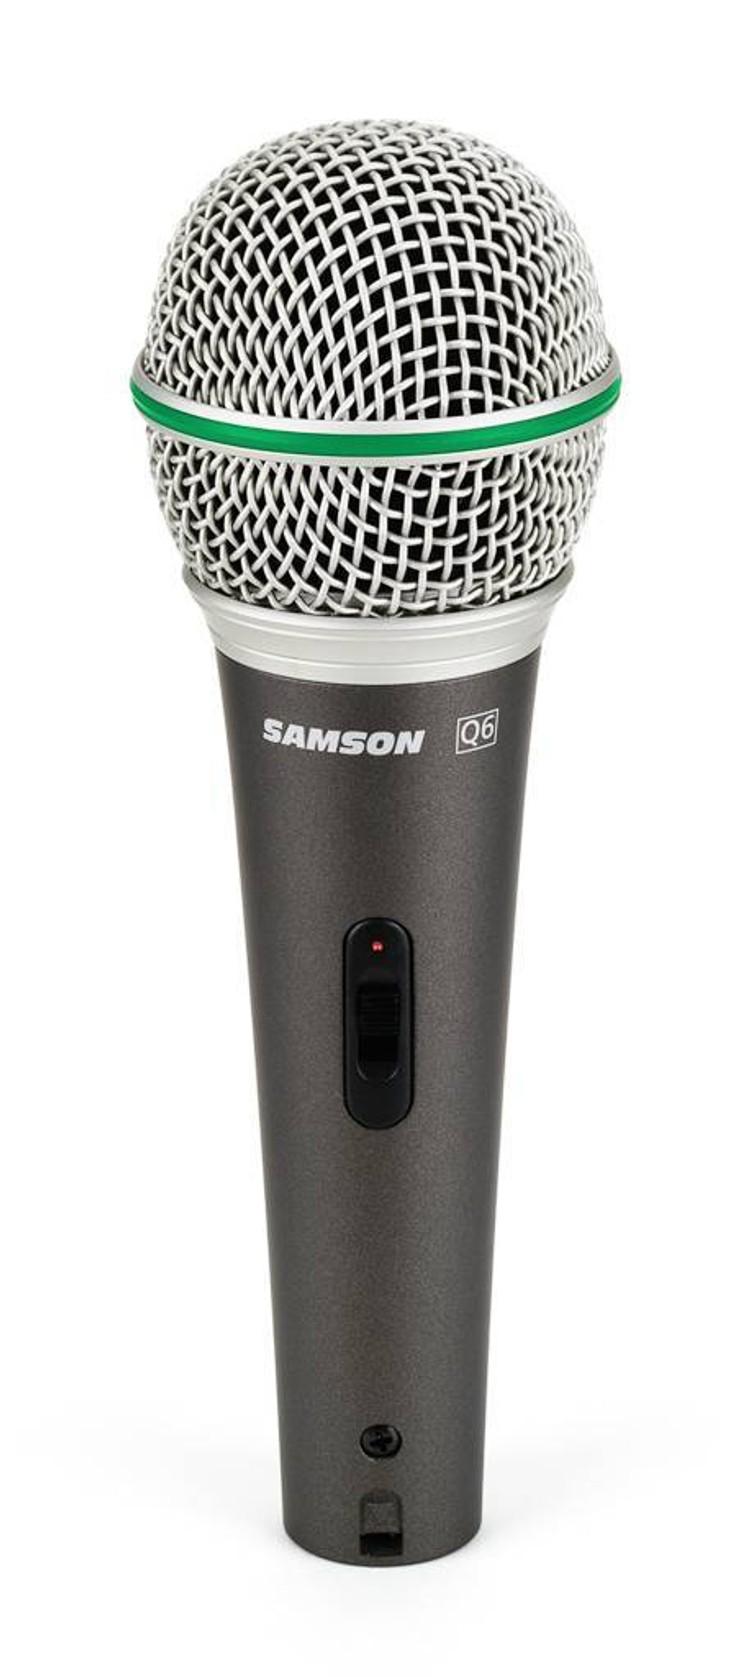 Samson microfoon